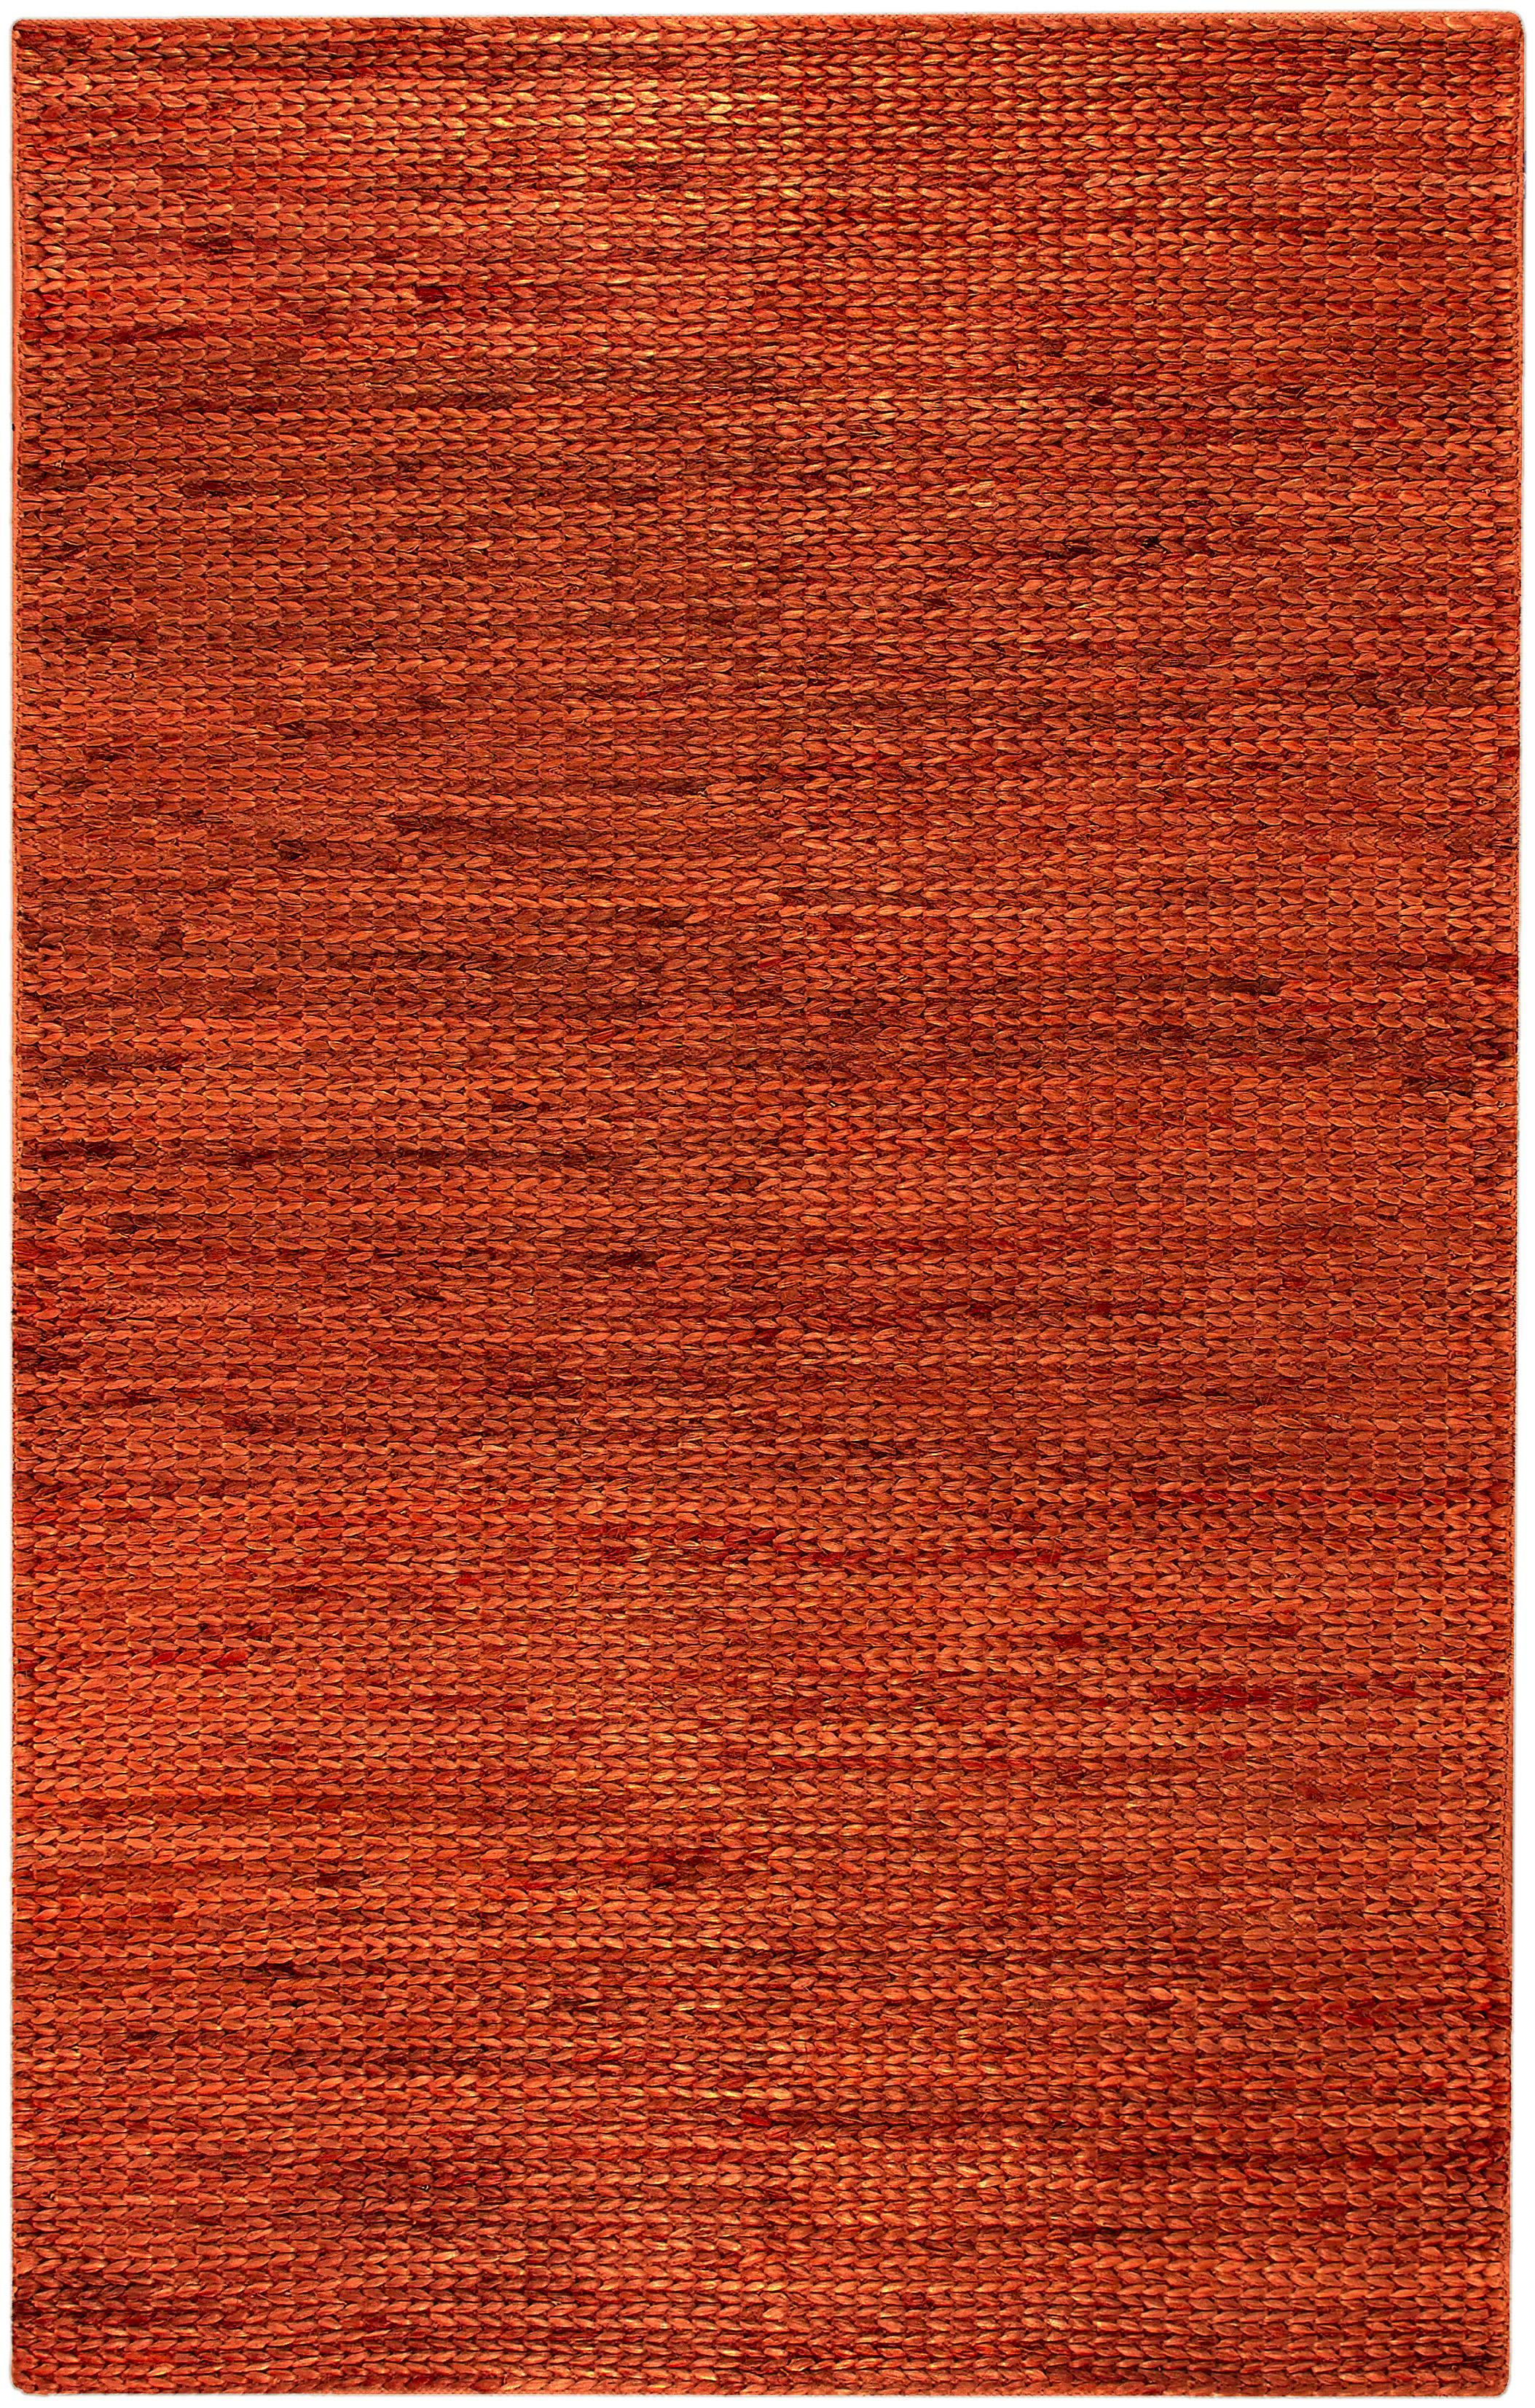 Surya Rugs Tropics 5' x 8' - Item Number: TRO1026-58